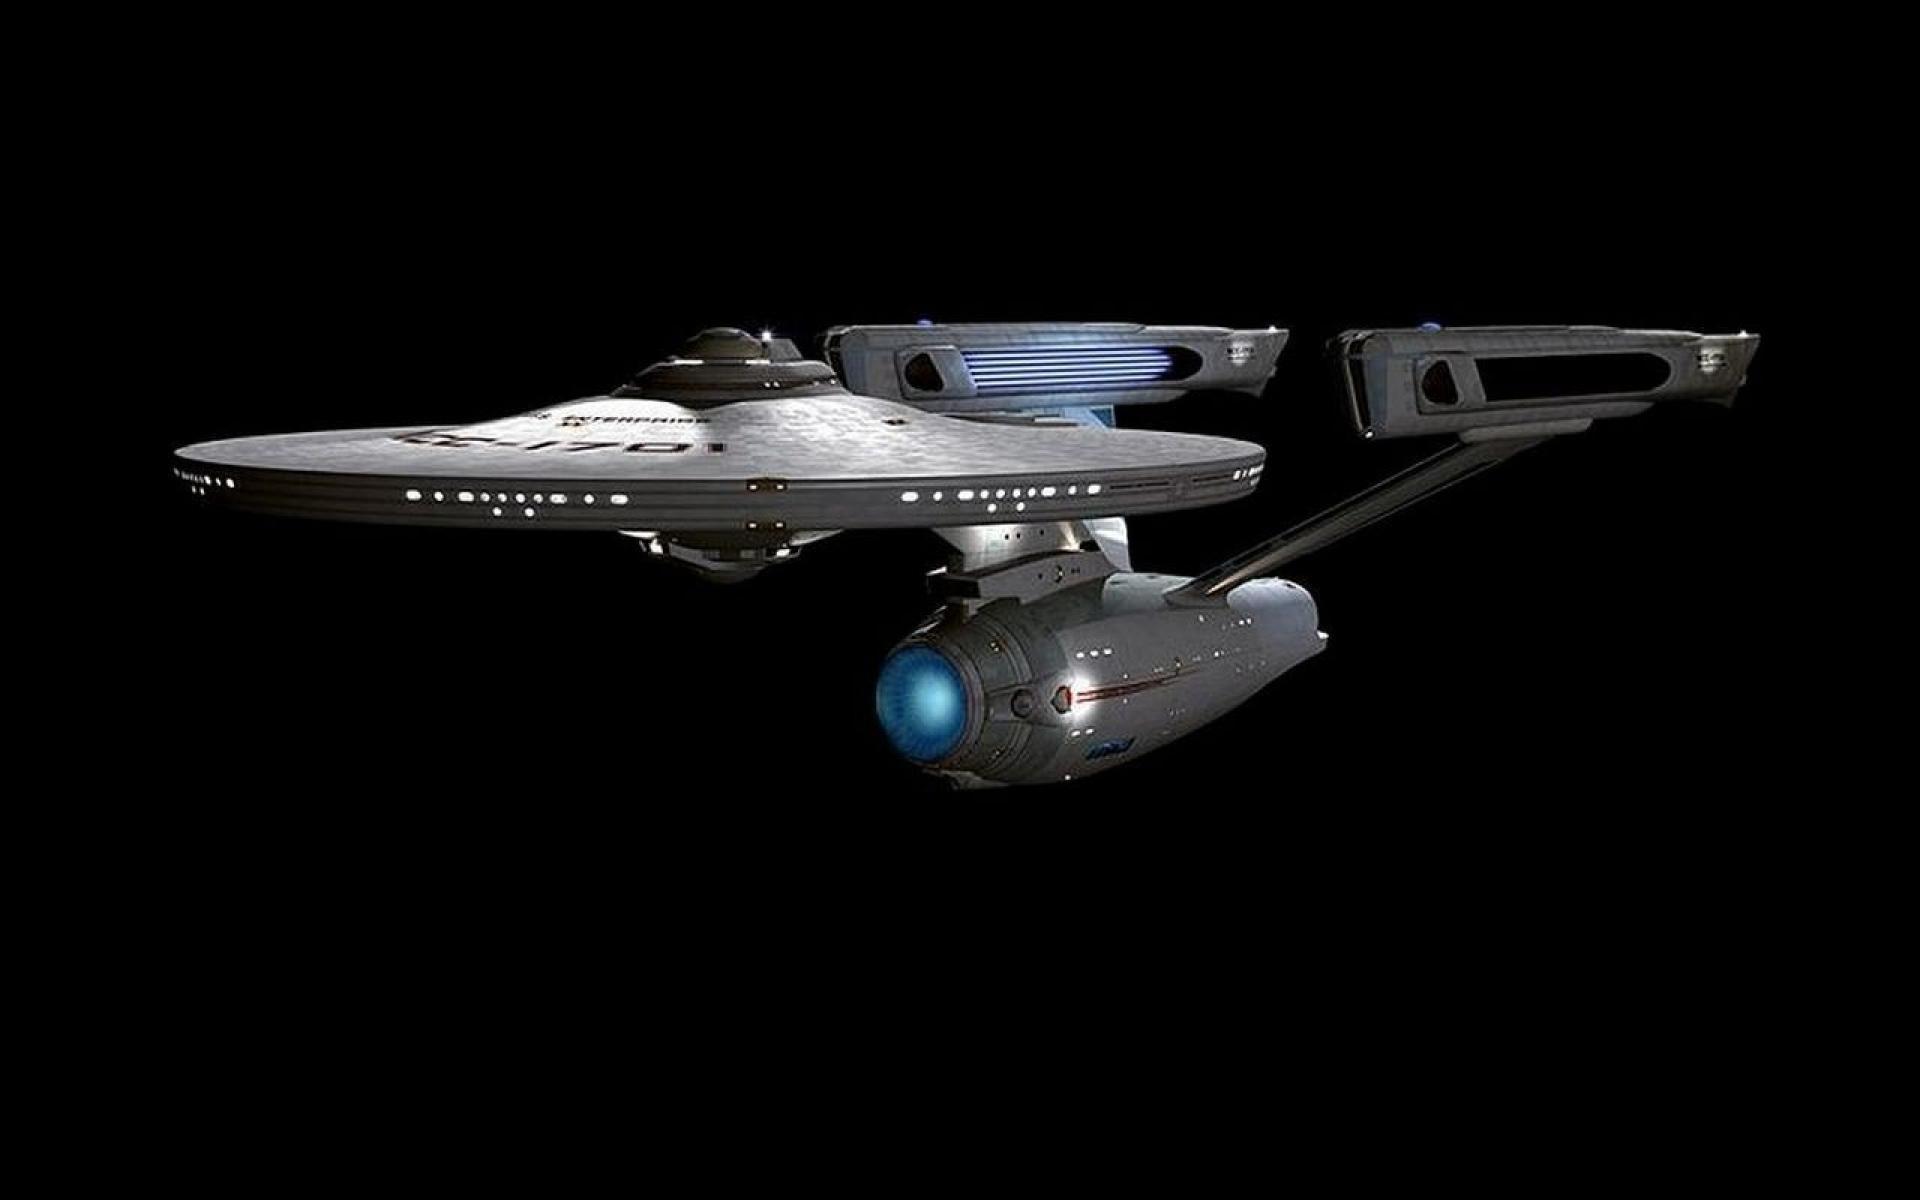 Star trek spaceships uss enterprise wallpaper 12263 1920x1200